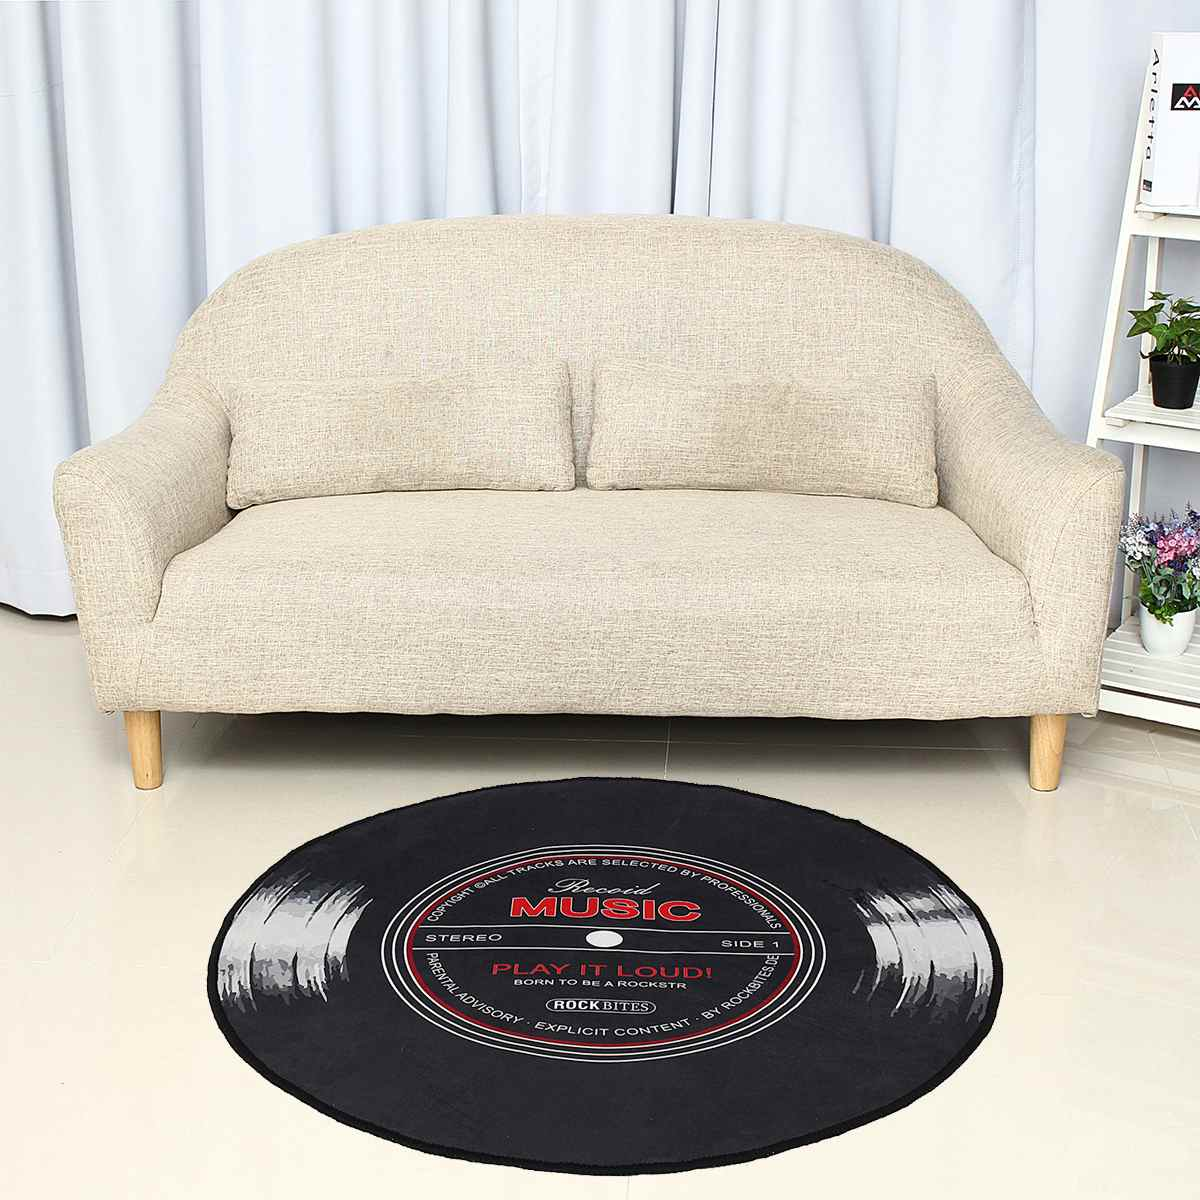 4 Size Music Carpet Rug Living Room Bedroom Kids Room 3D Vinyl Record Printed Round Floor Mat Chair Home Kitchen Decor Anti Slip